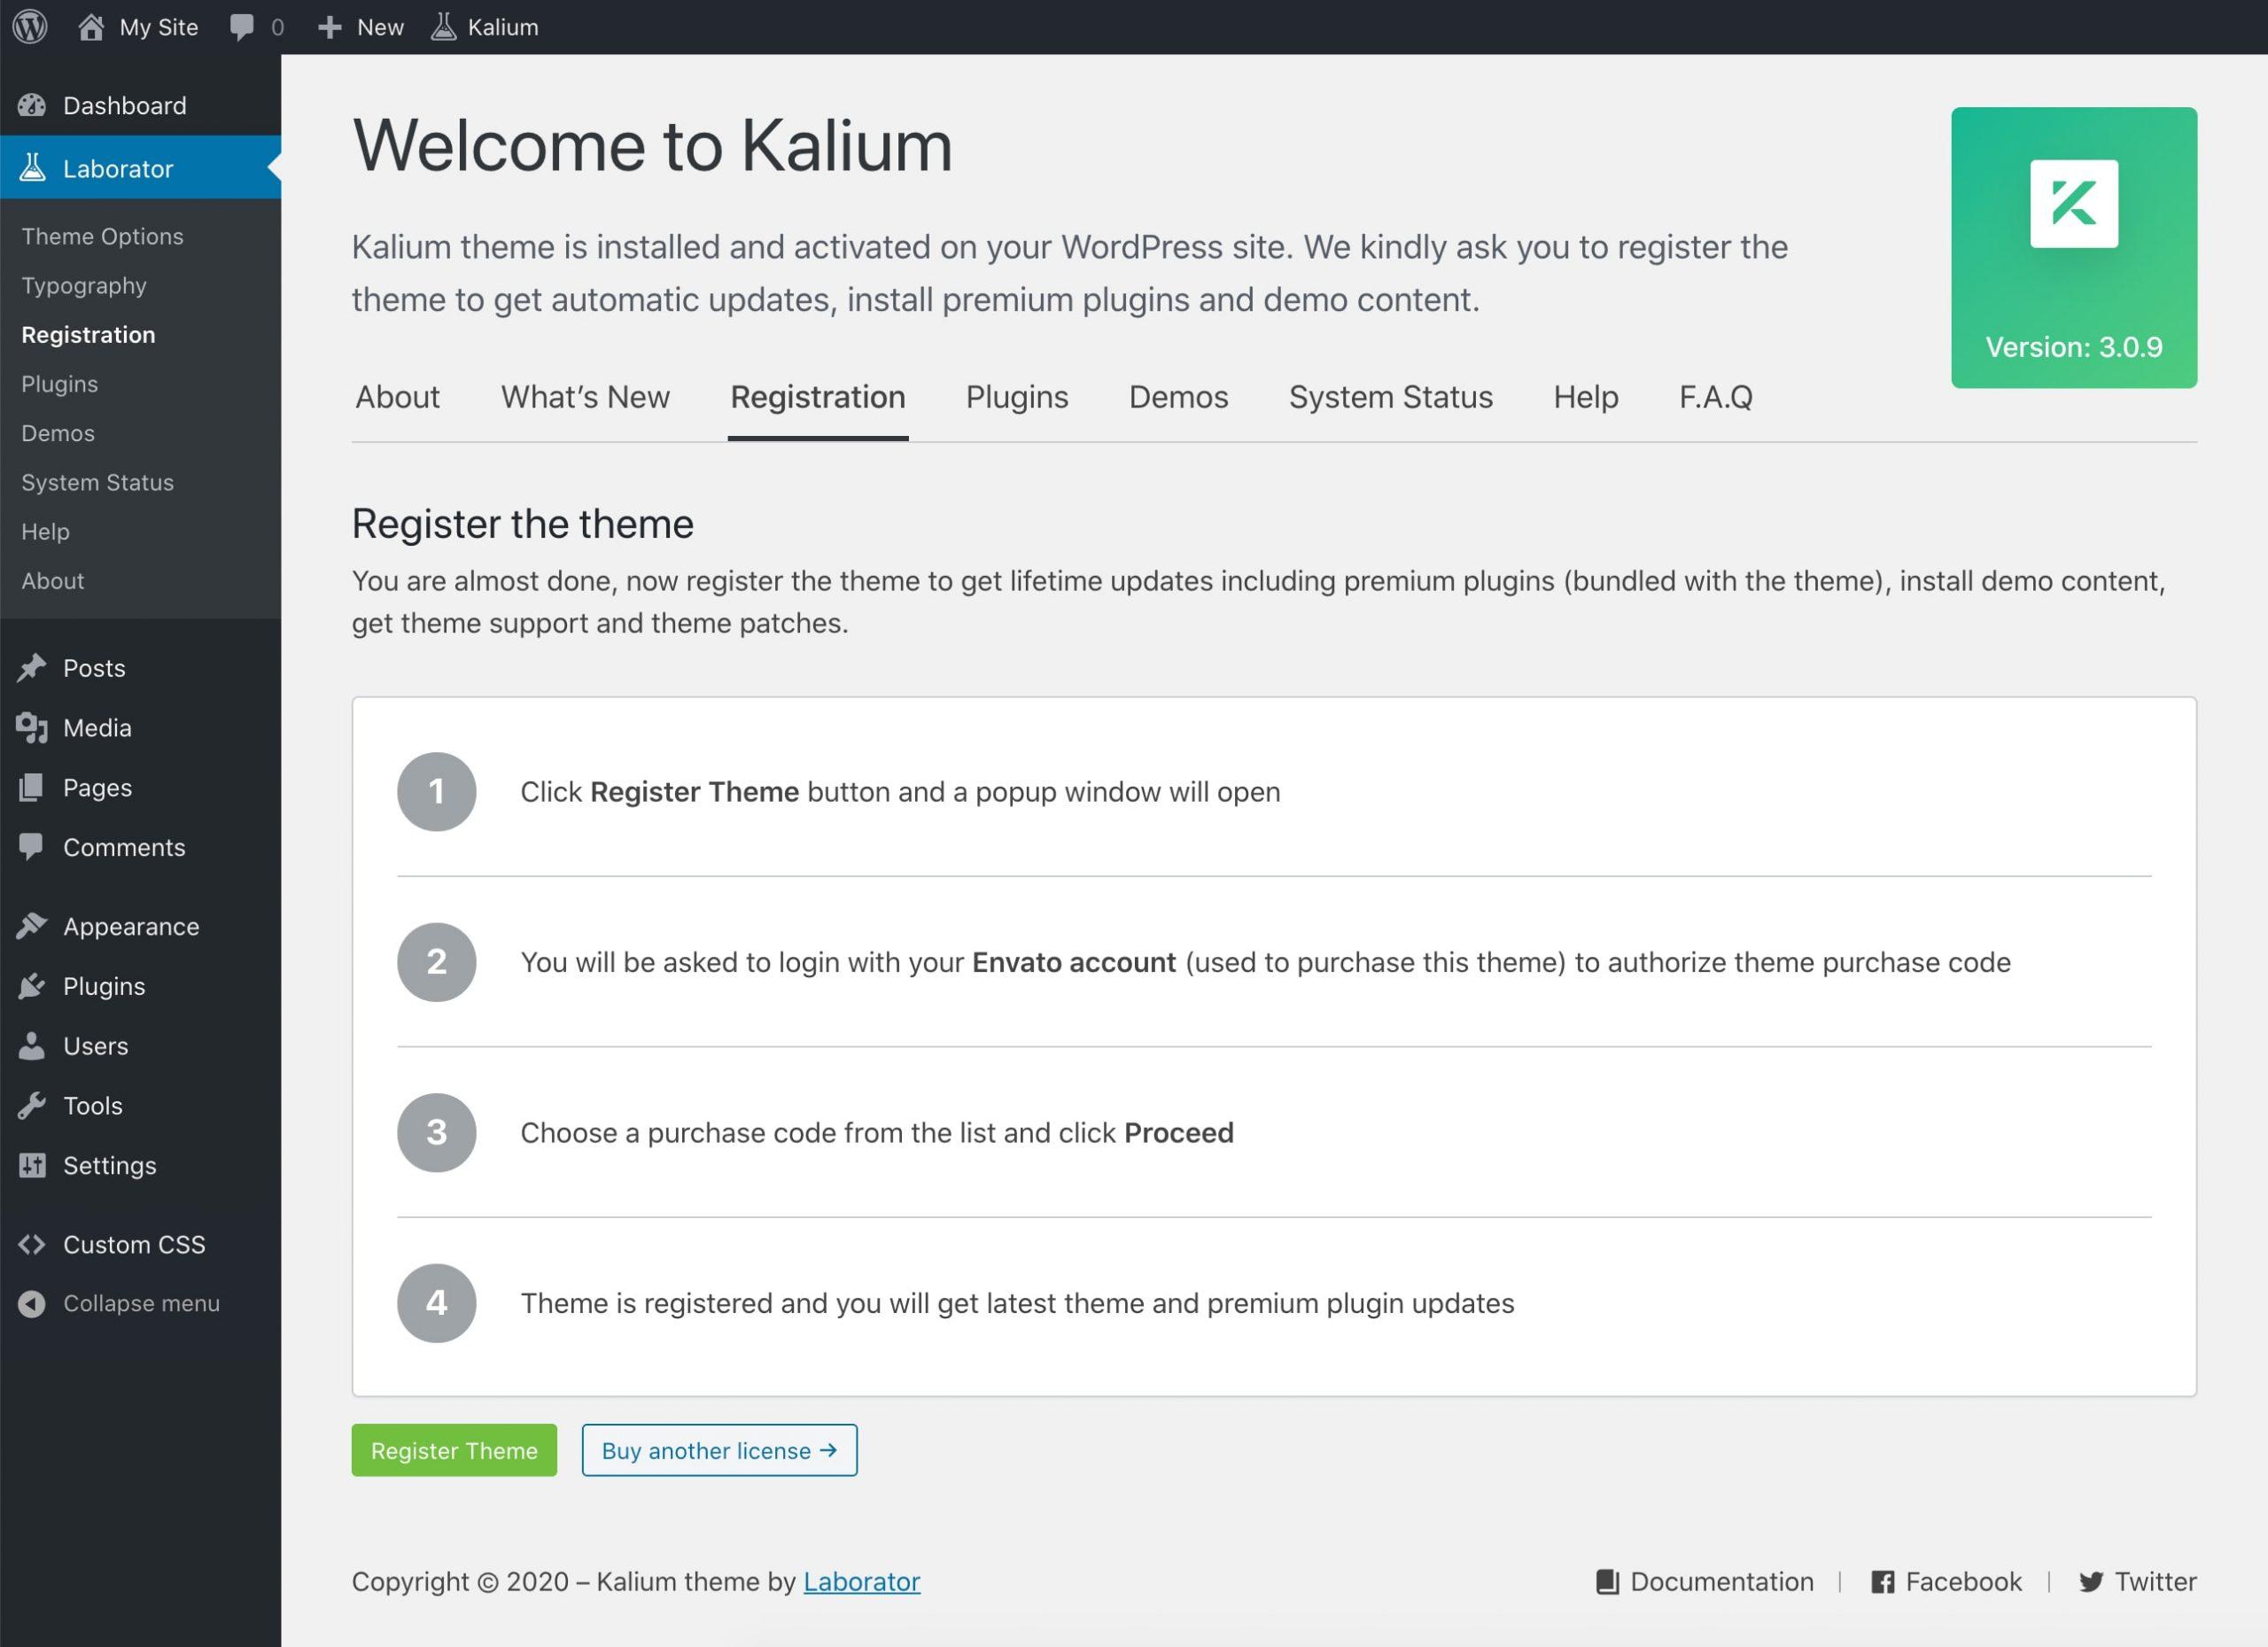 Kalium Theme Registration page